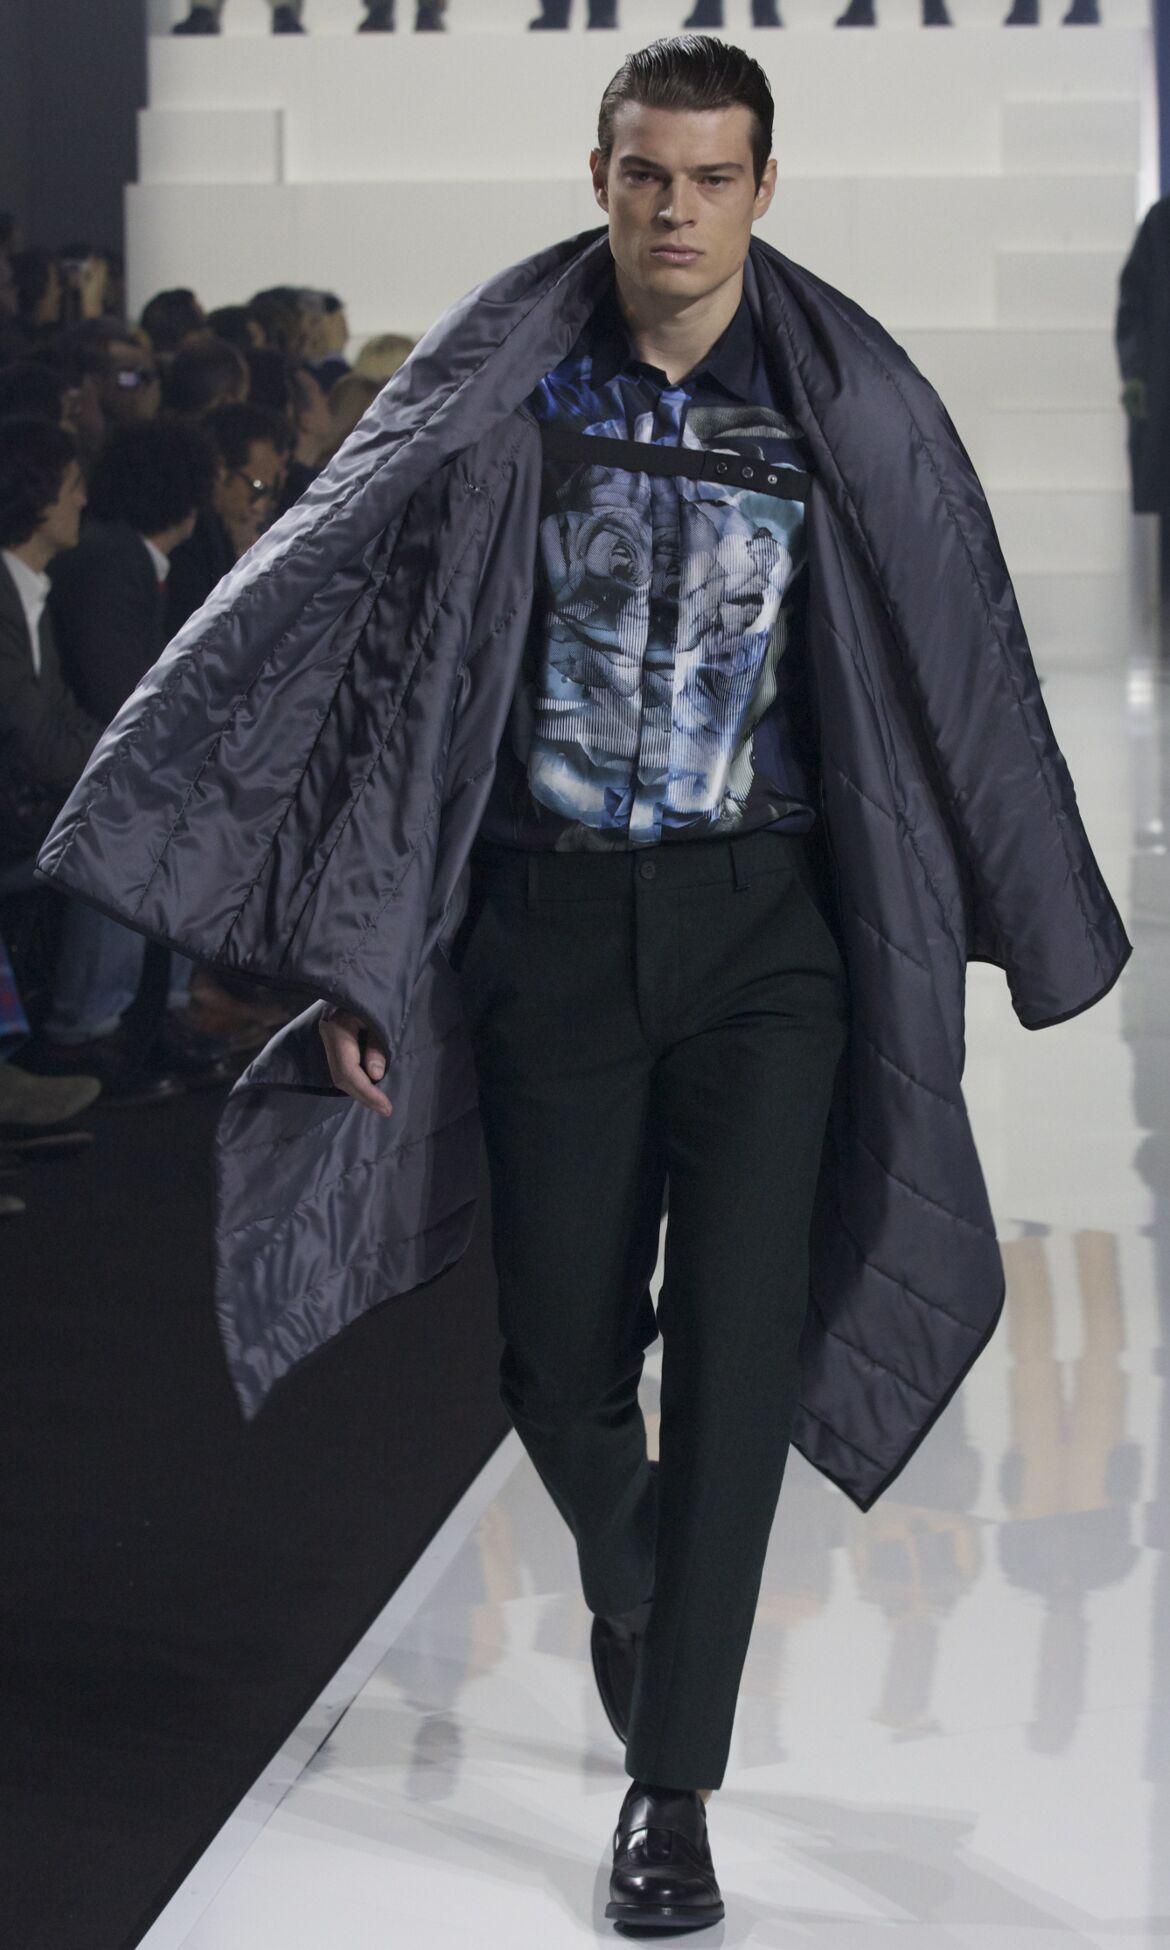 Fashion Model Dirk Bikkembergs Catwalk